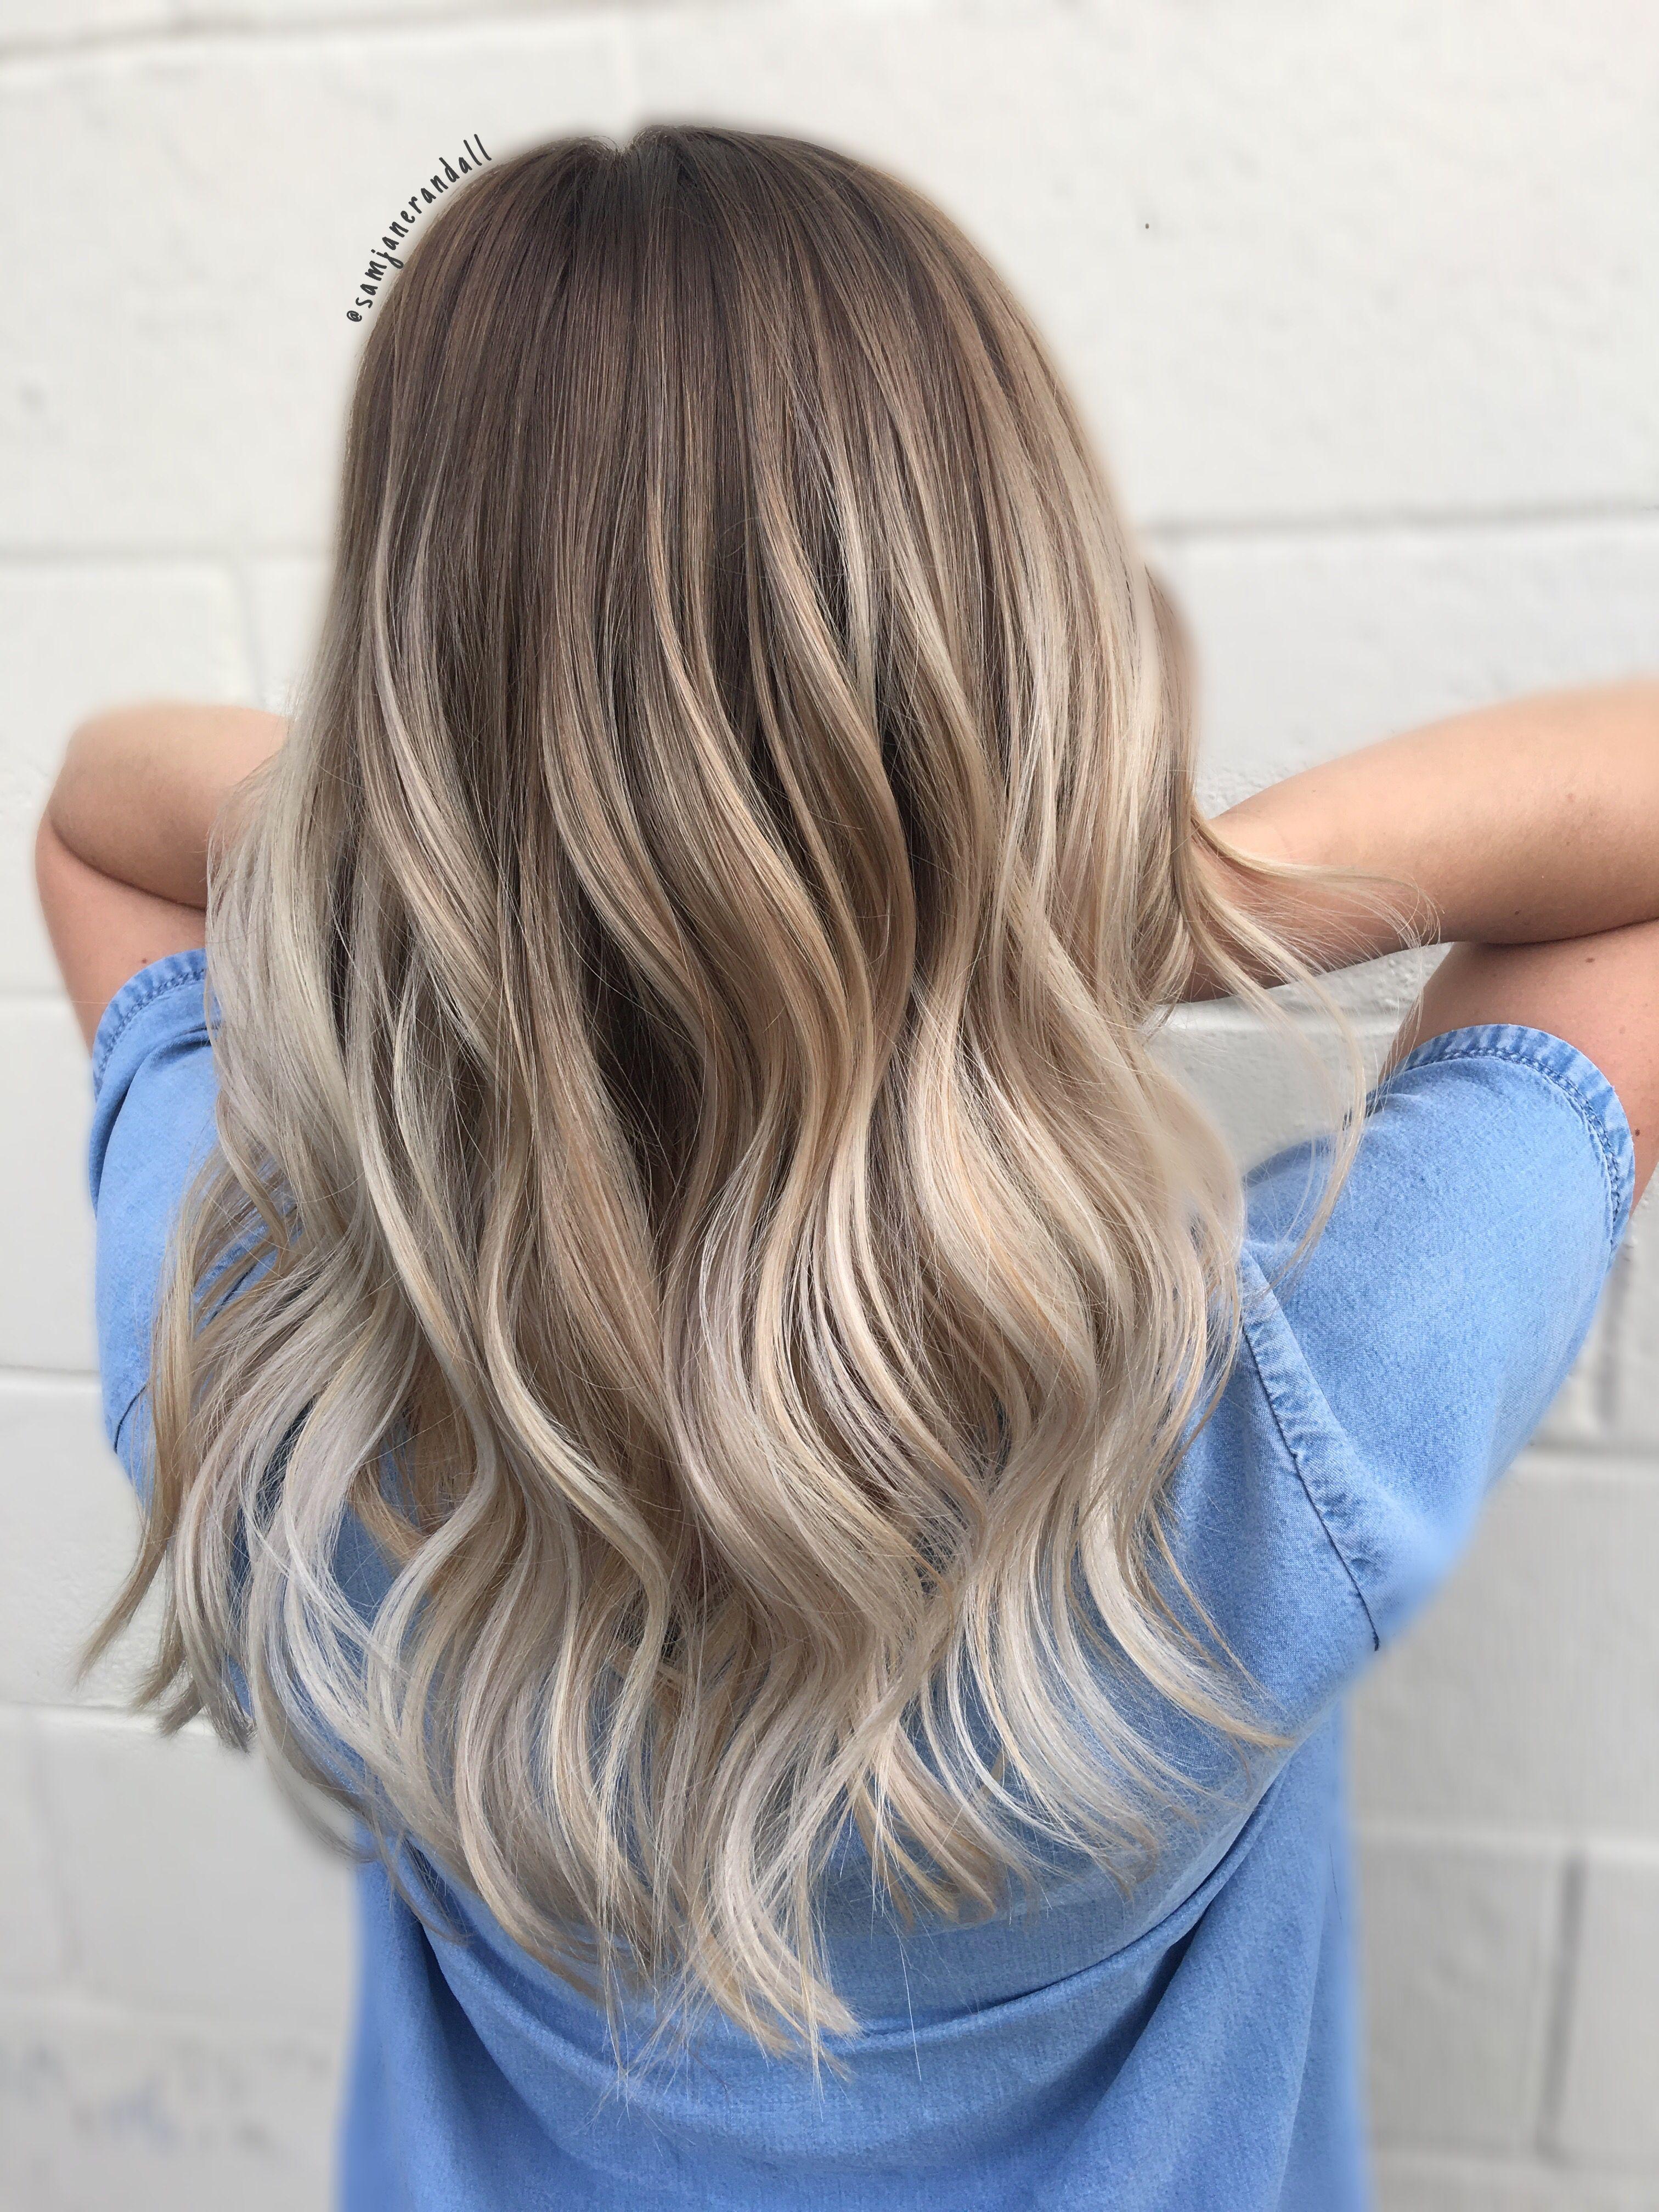 blonde balayage color melt nice pinterest haar ideen haare balayage und mittellange haare. Black Bedroom Furniture Sets. Home Design Ideas